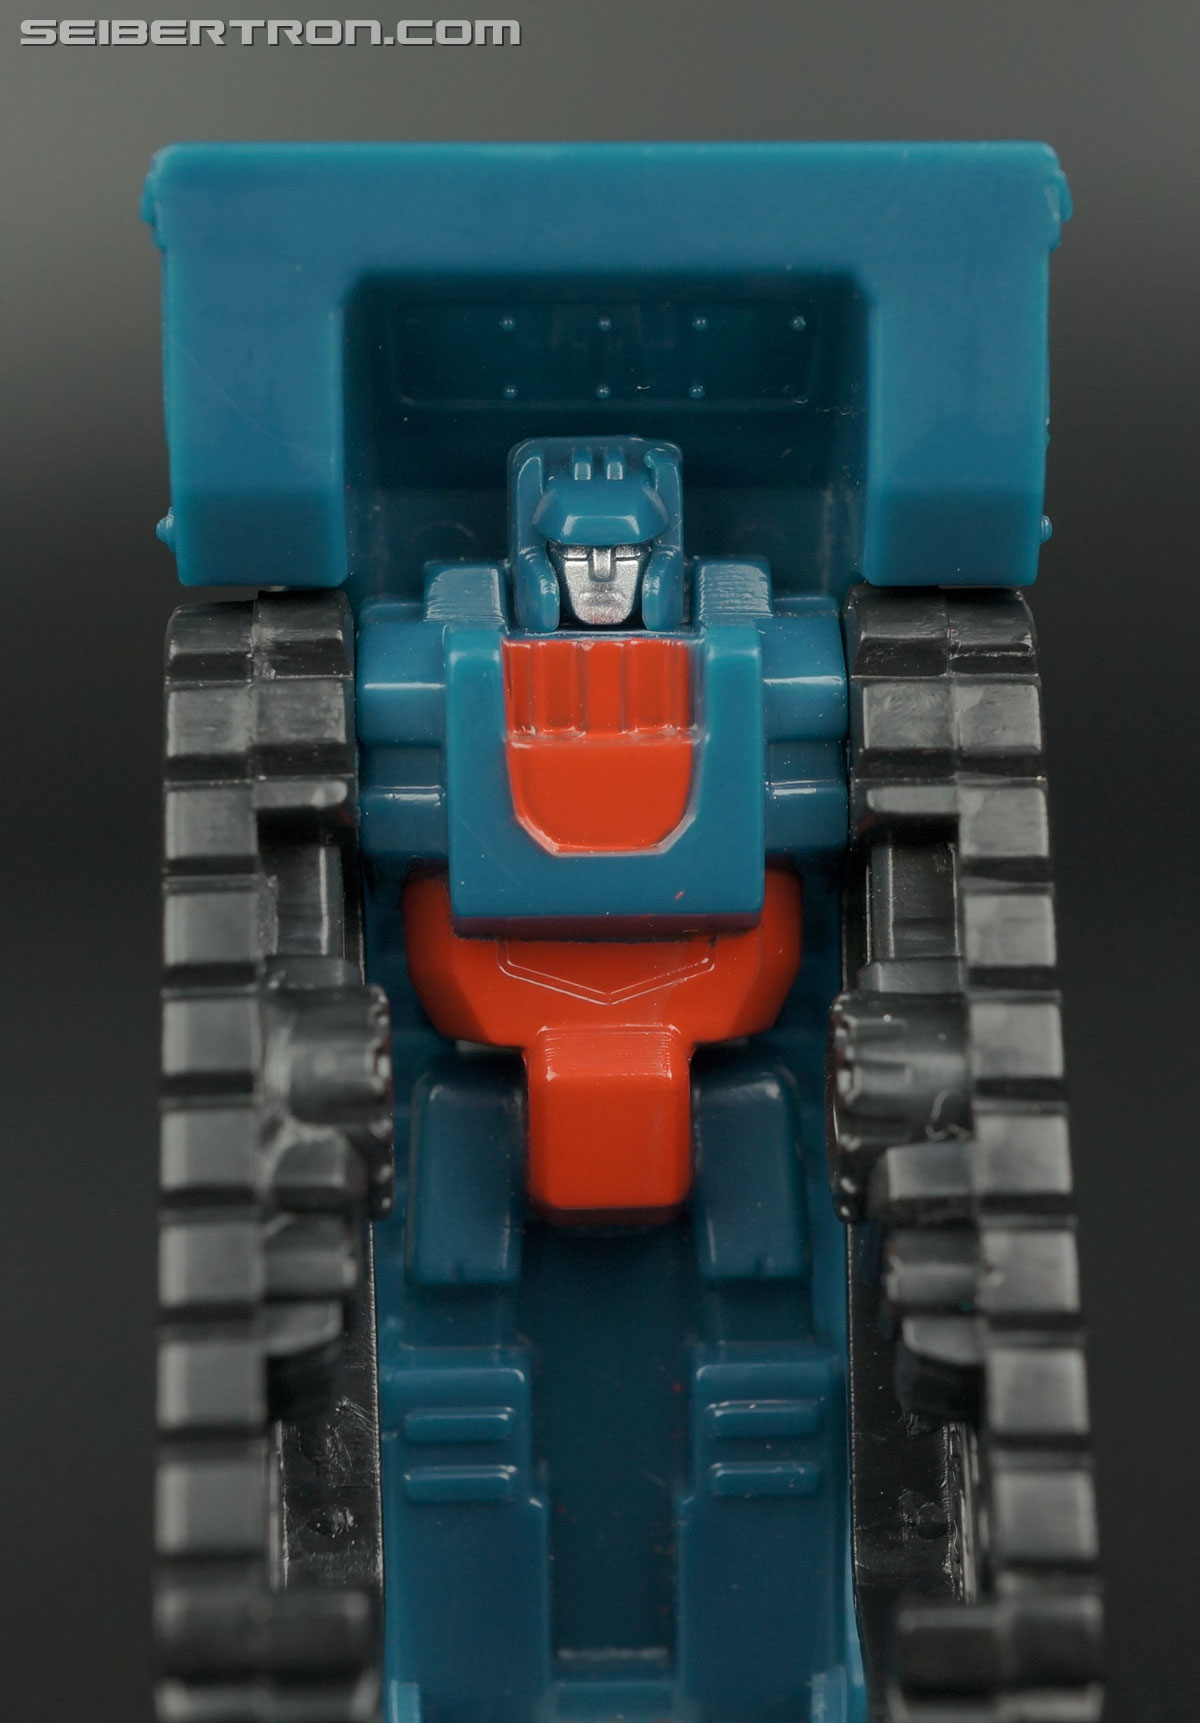 Transformers Legends Groundshaker (Image #37 of 66)